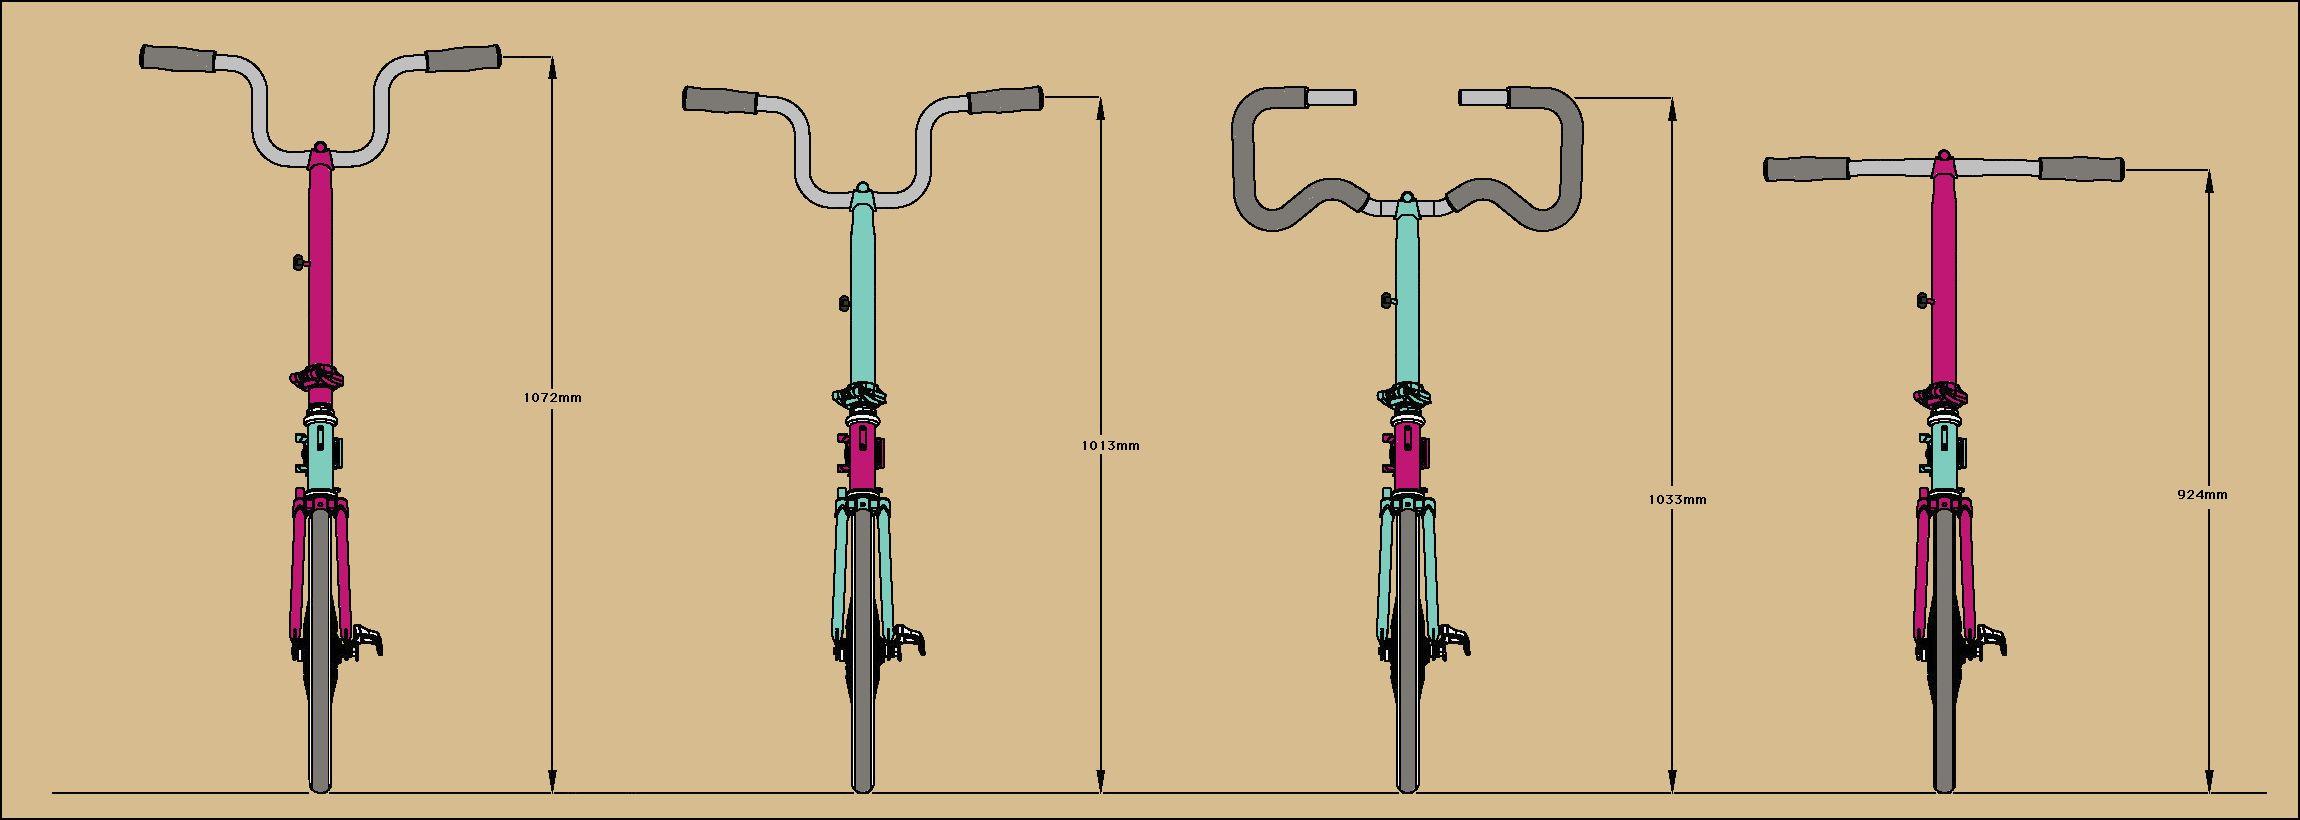 H Bar Comparison Front Jpg 2 300 820 Pixels Beautiful Bike